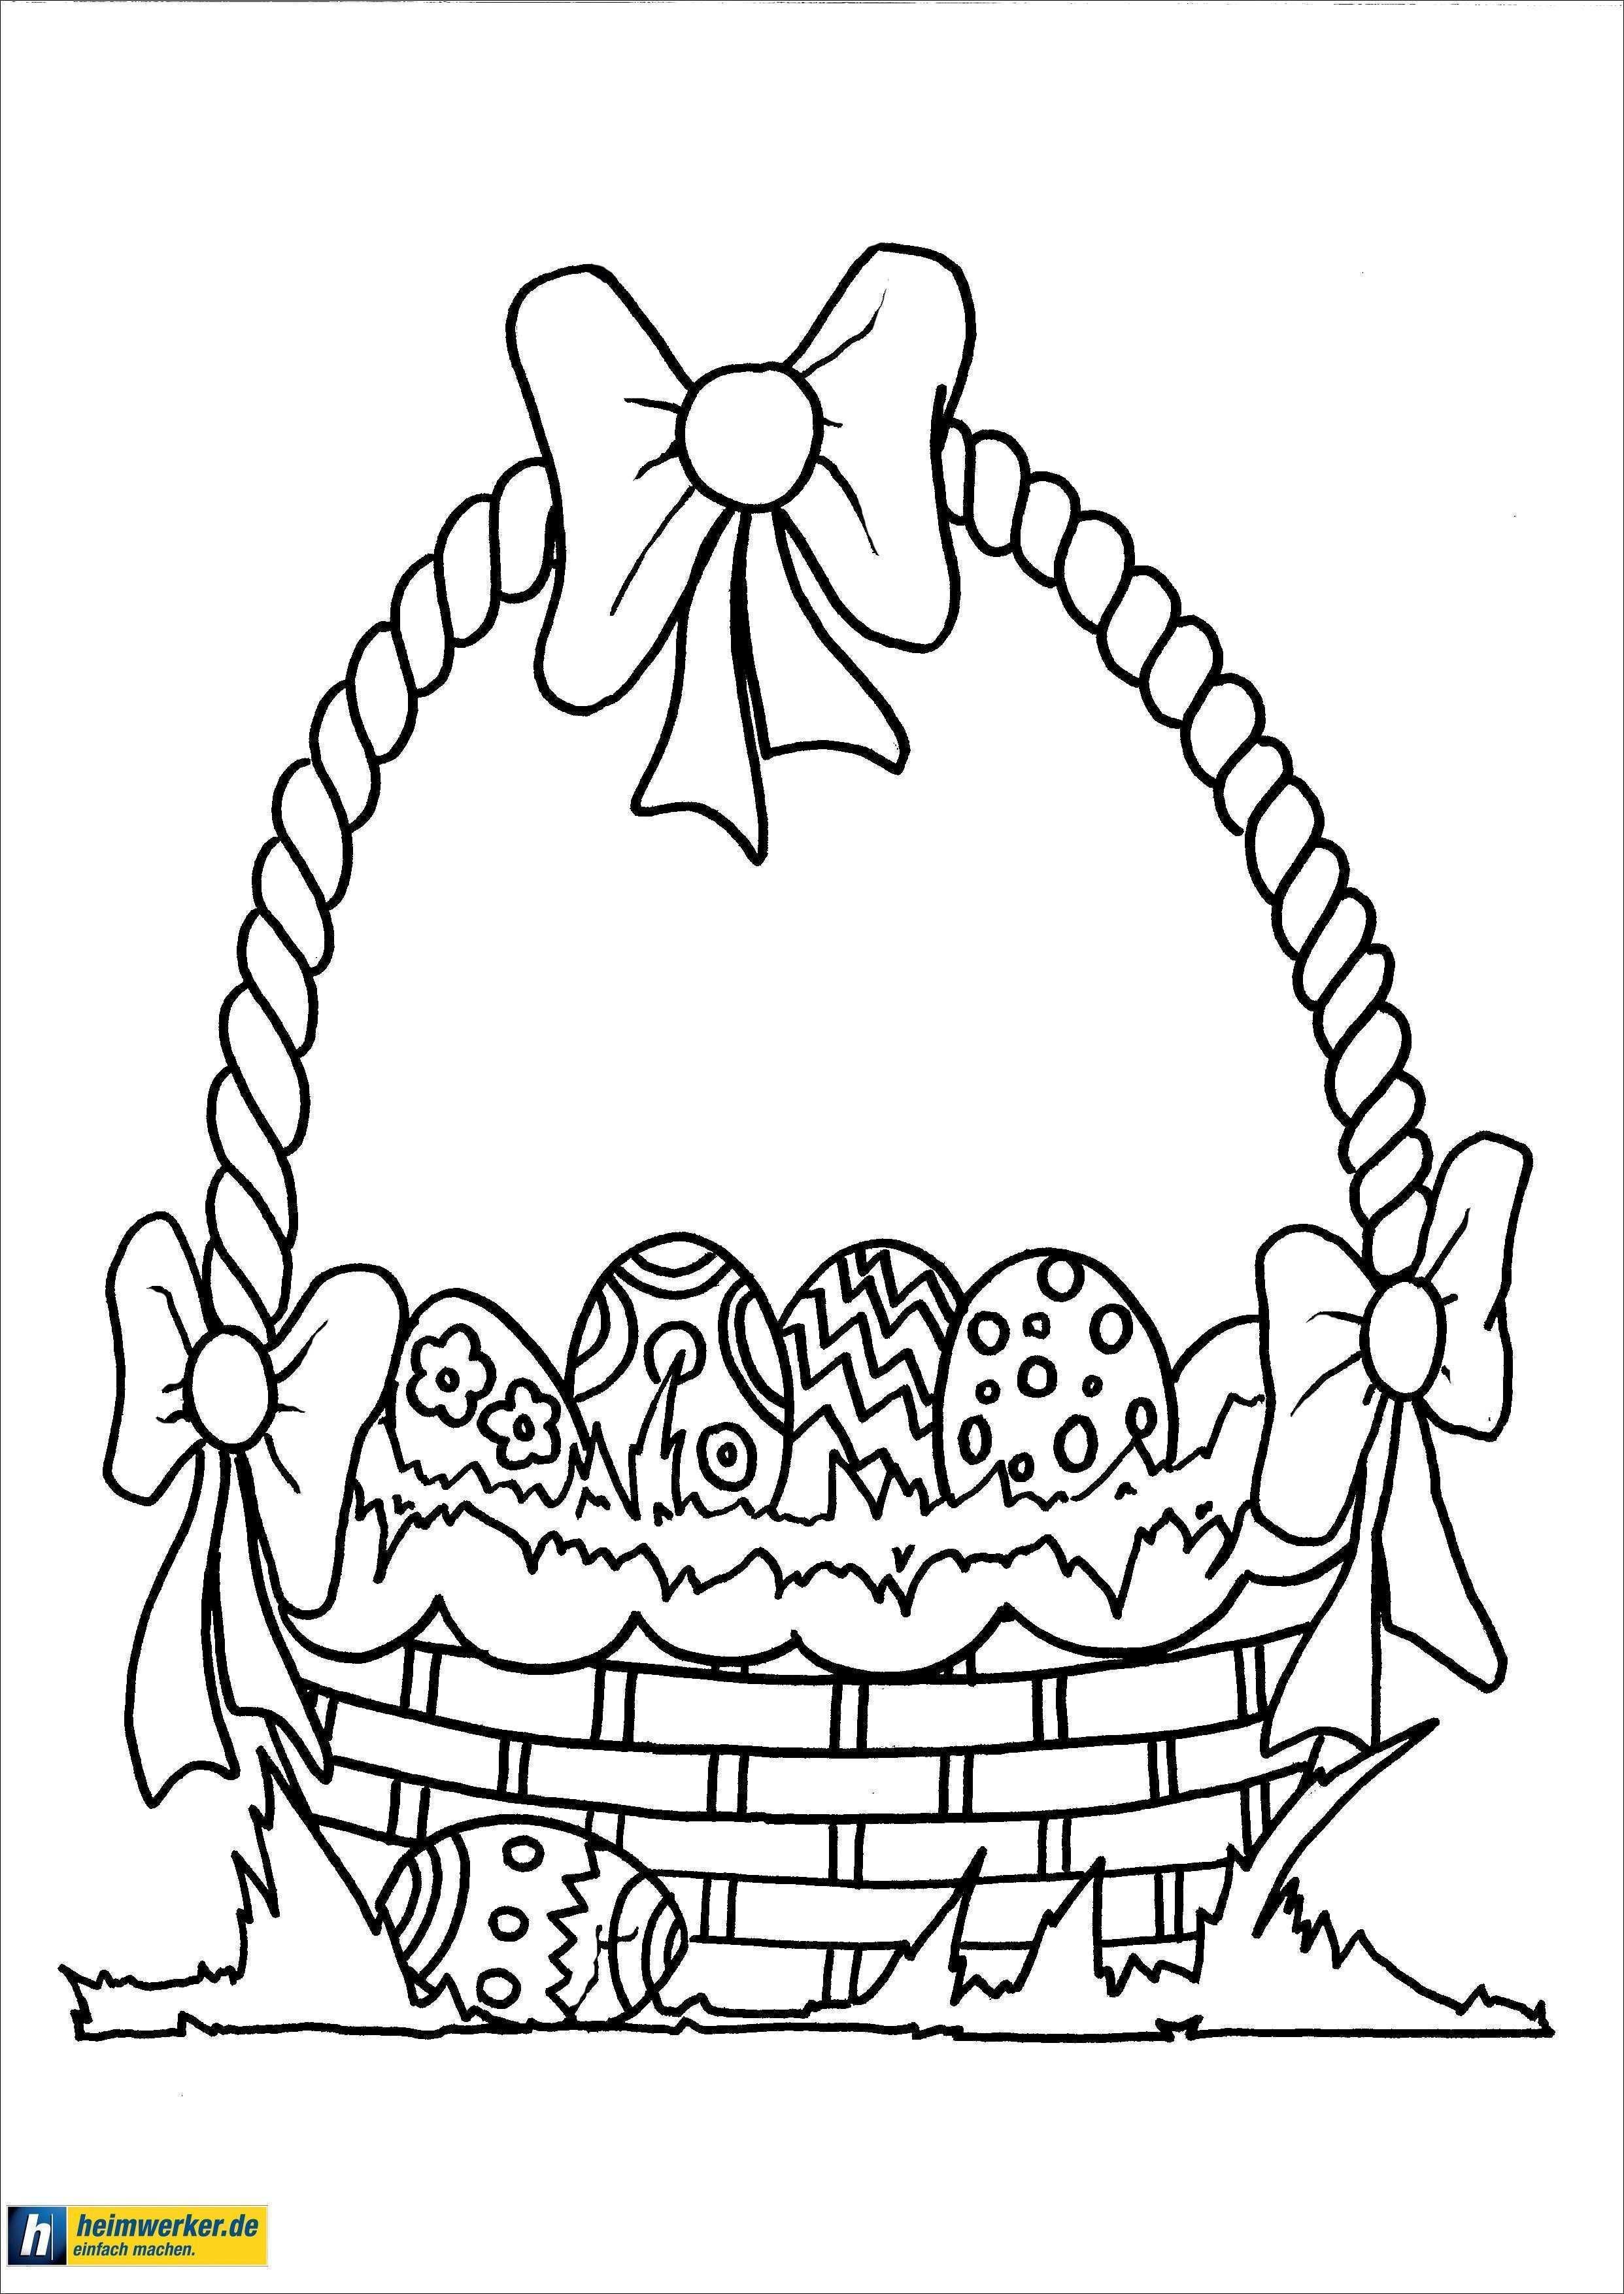 Harry Potter Ausmalbilder Wappen Neu Harry Potter Ausmalbilder Wappen Bildnis – Ausmalbilder Ideen Galerie